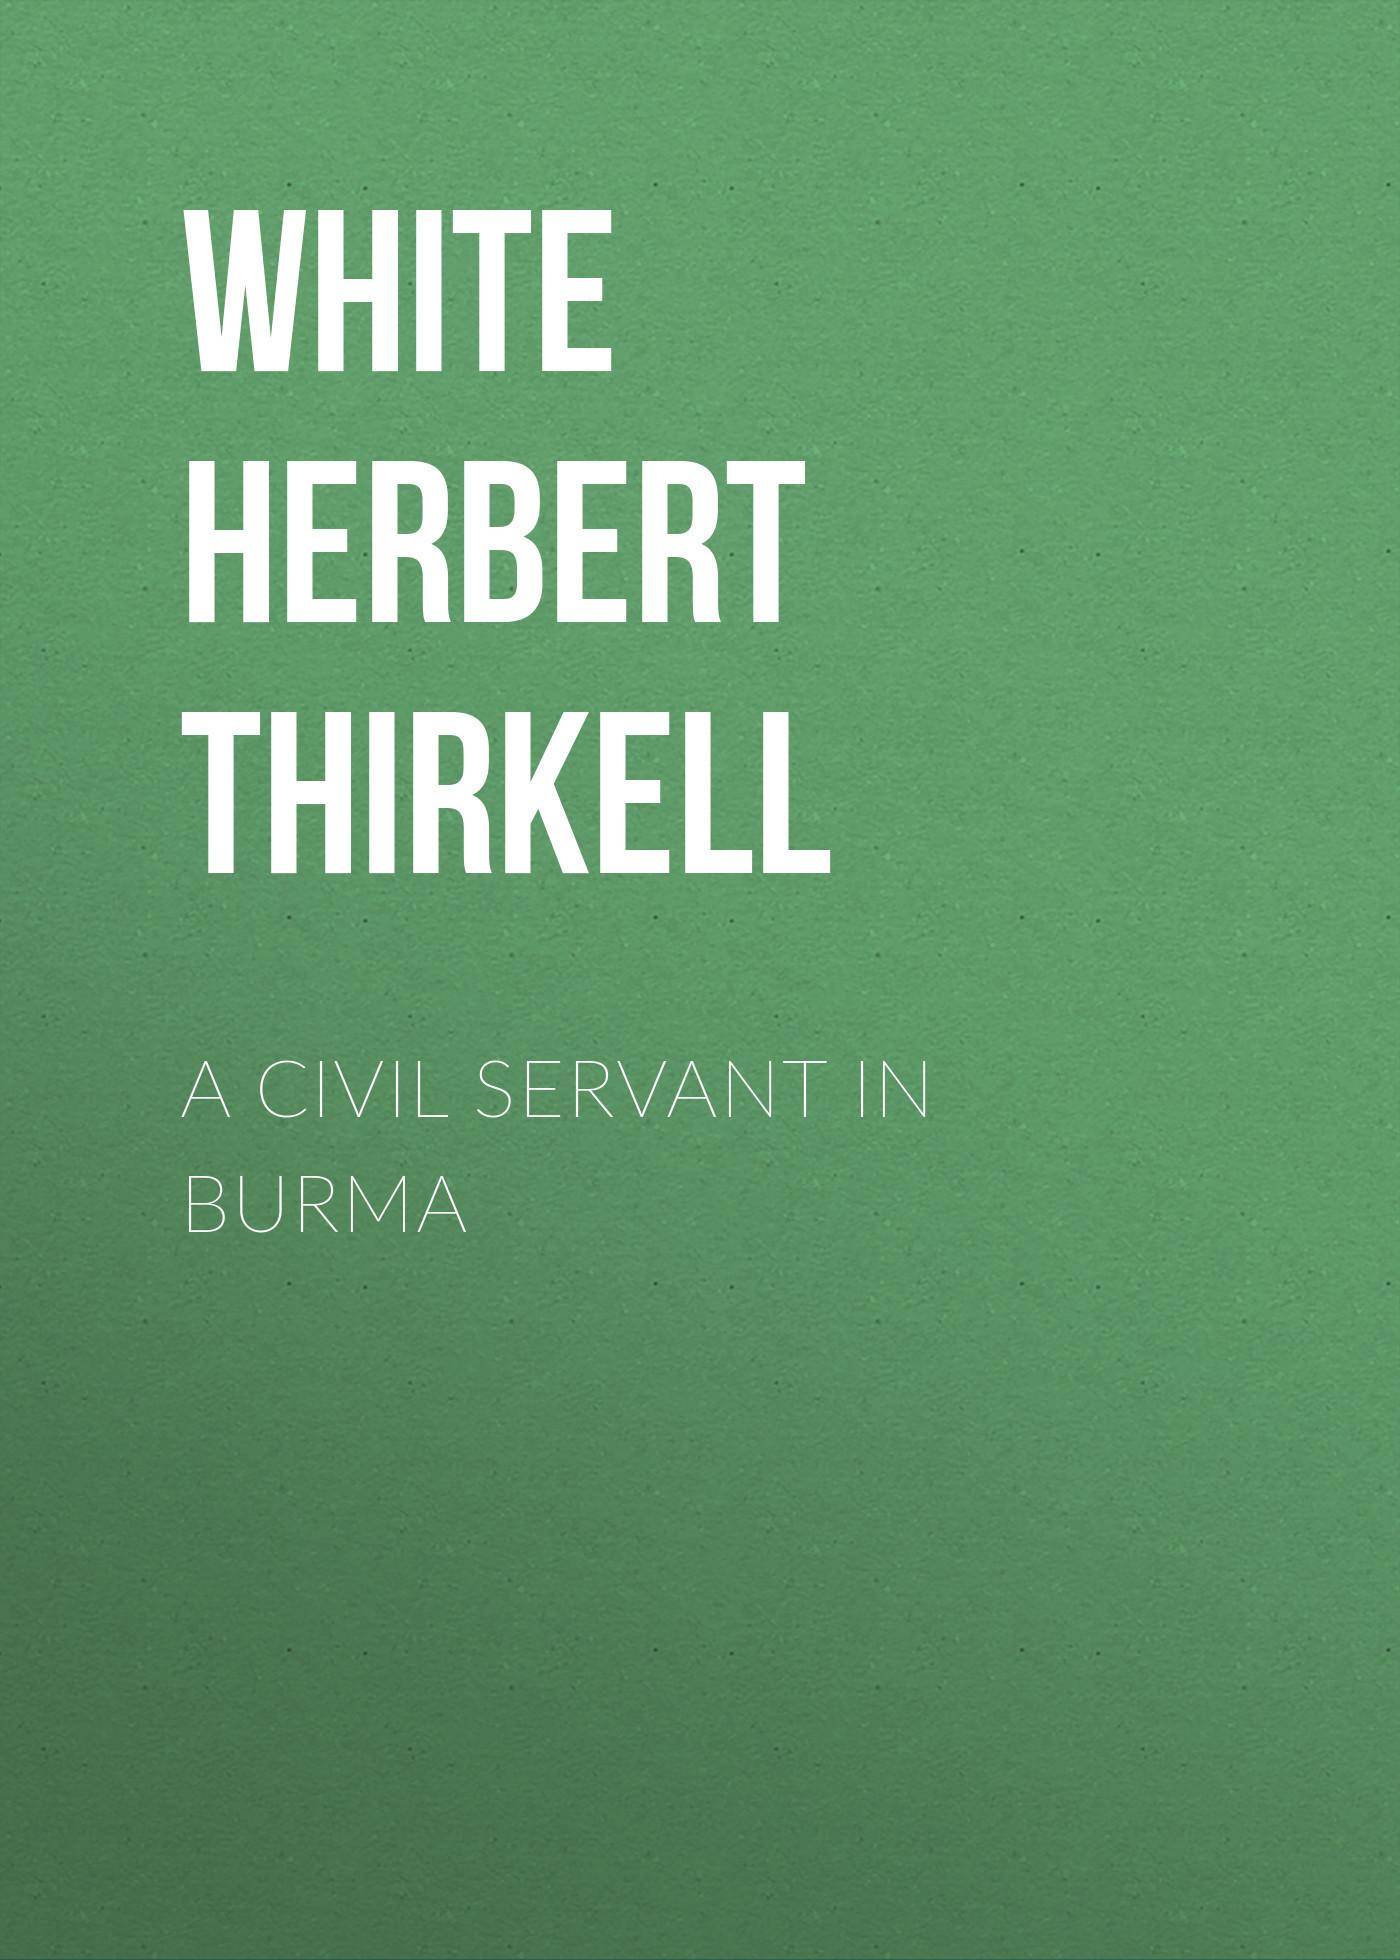 White Herbert Thirkell A Civil Servant in Burma burma 44